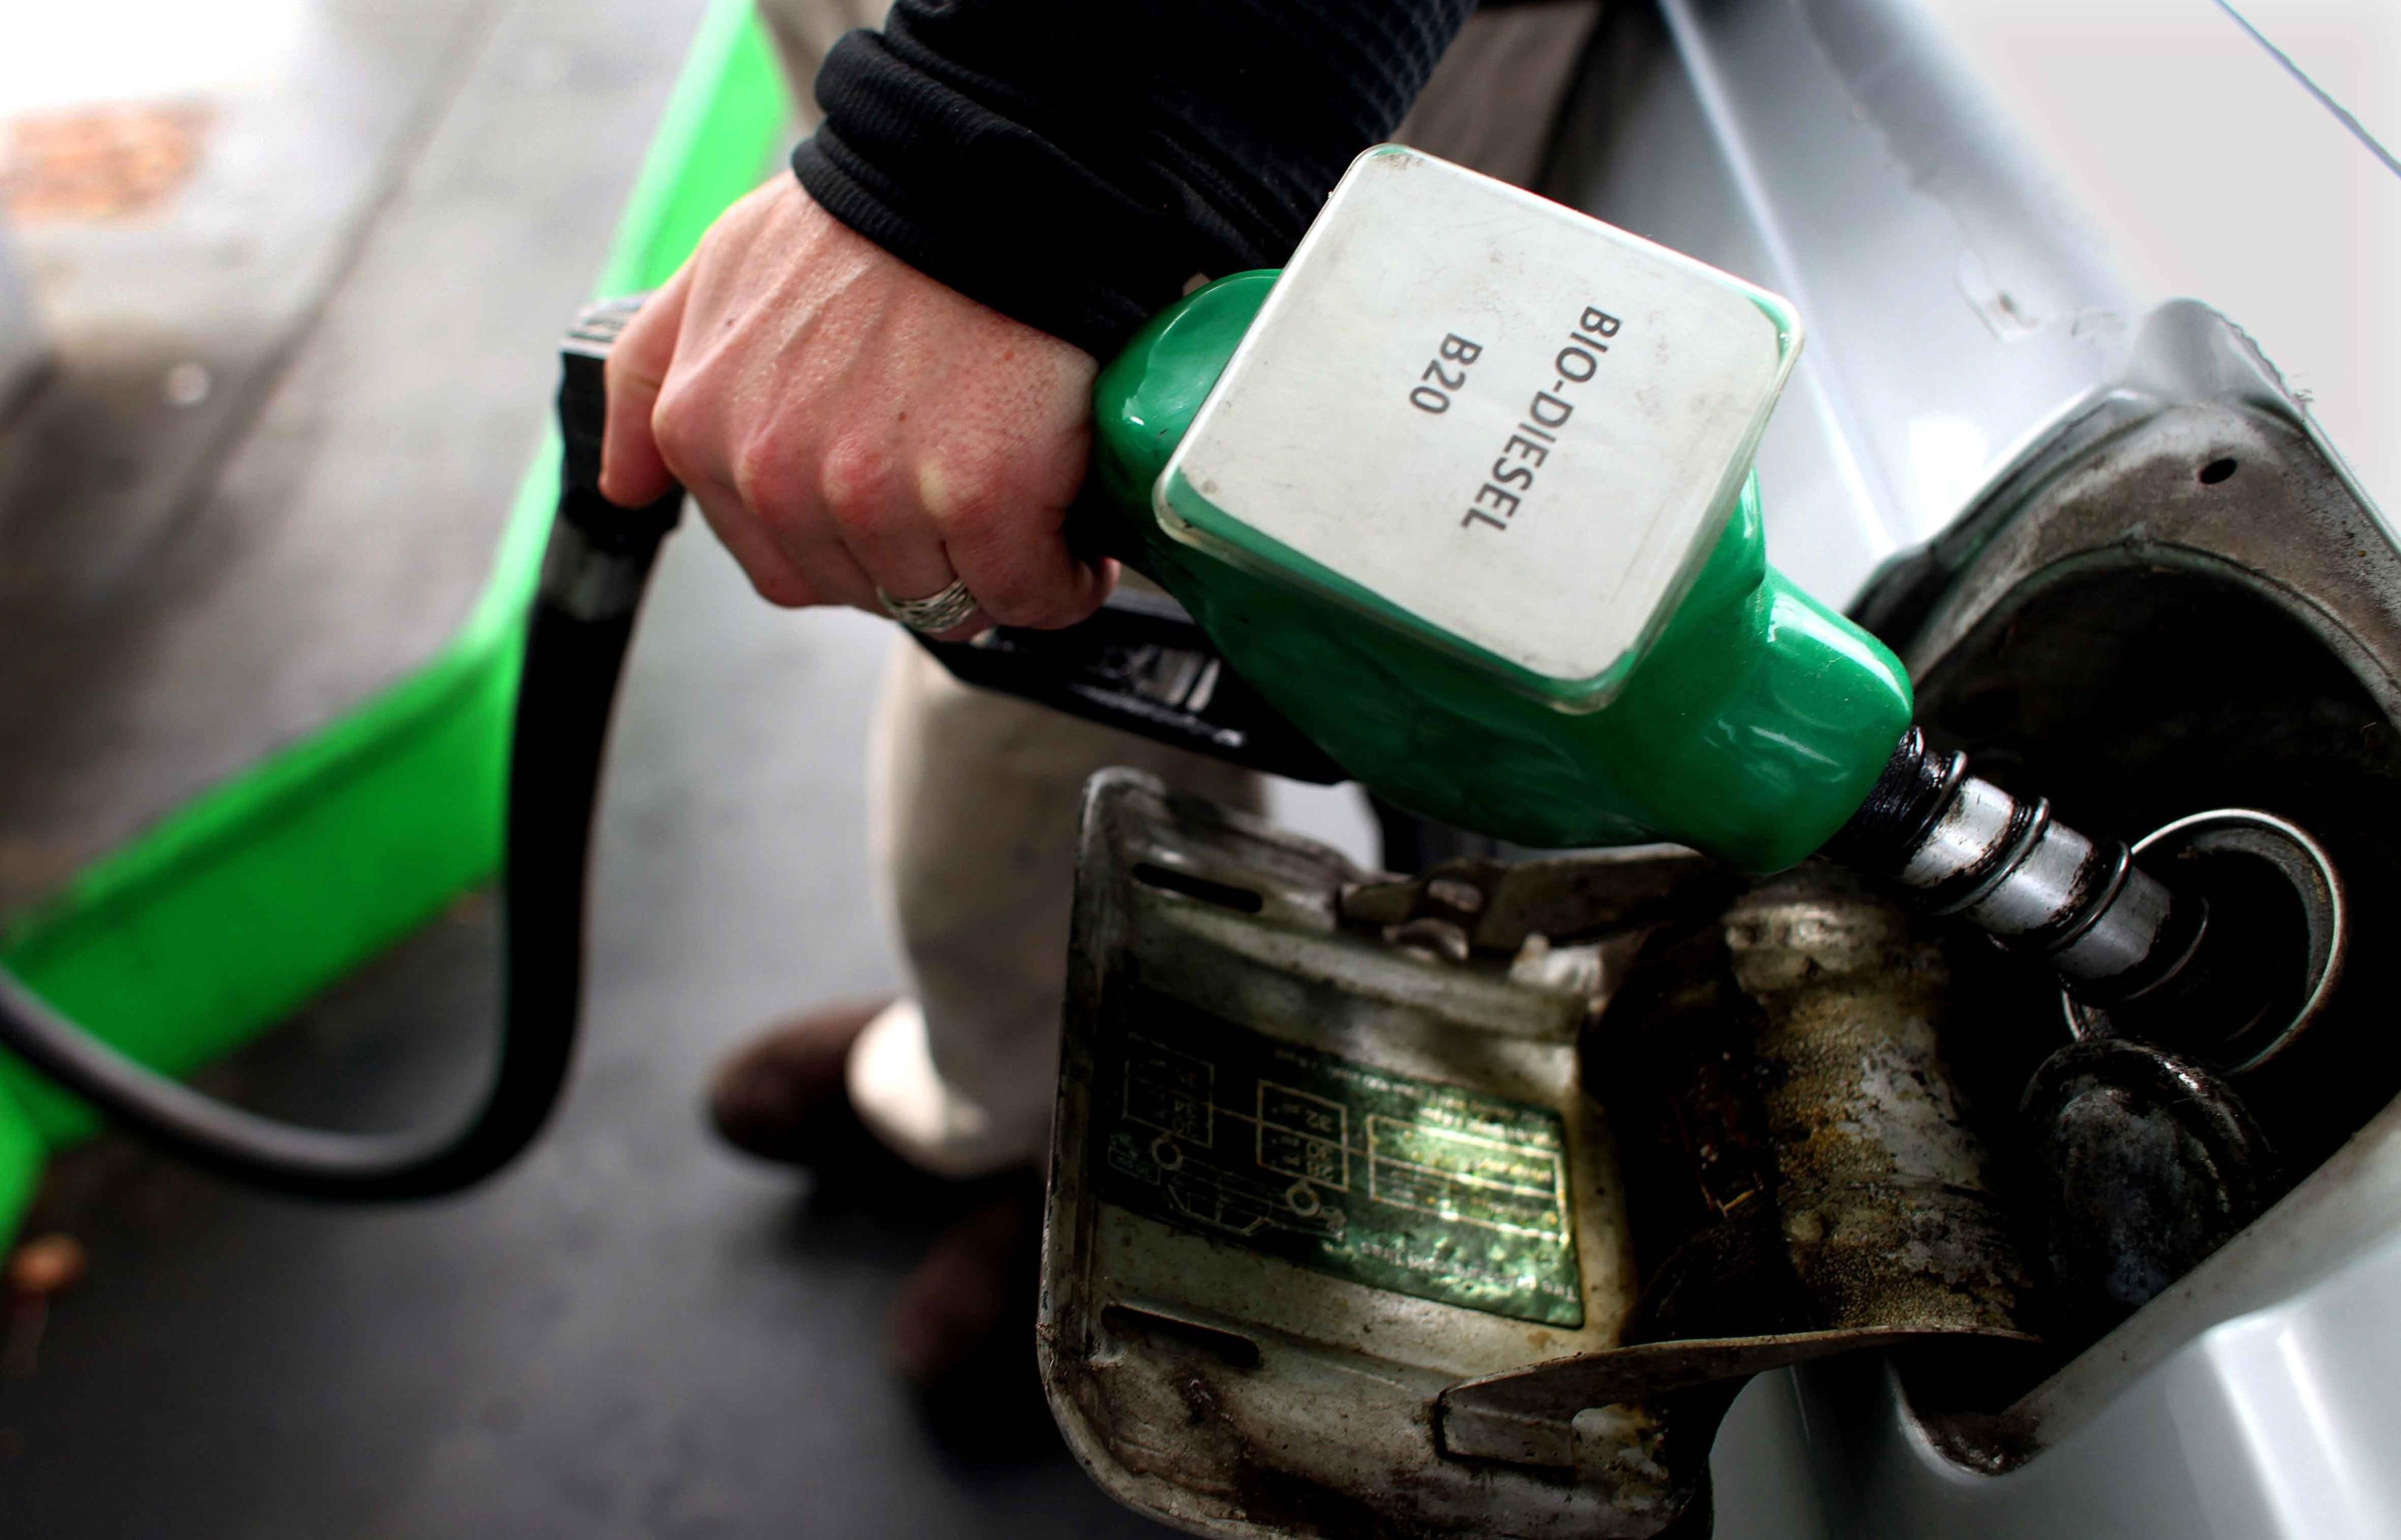 Percentual de 12% de biodiesel no diesel passa a valer a partir de ...